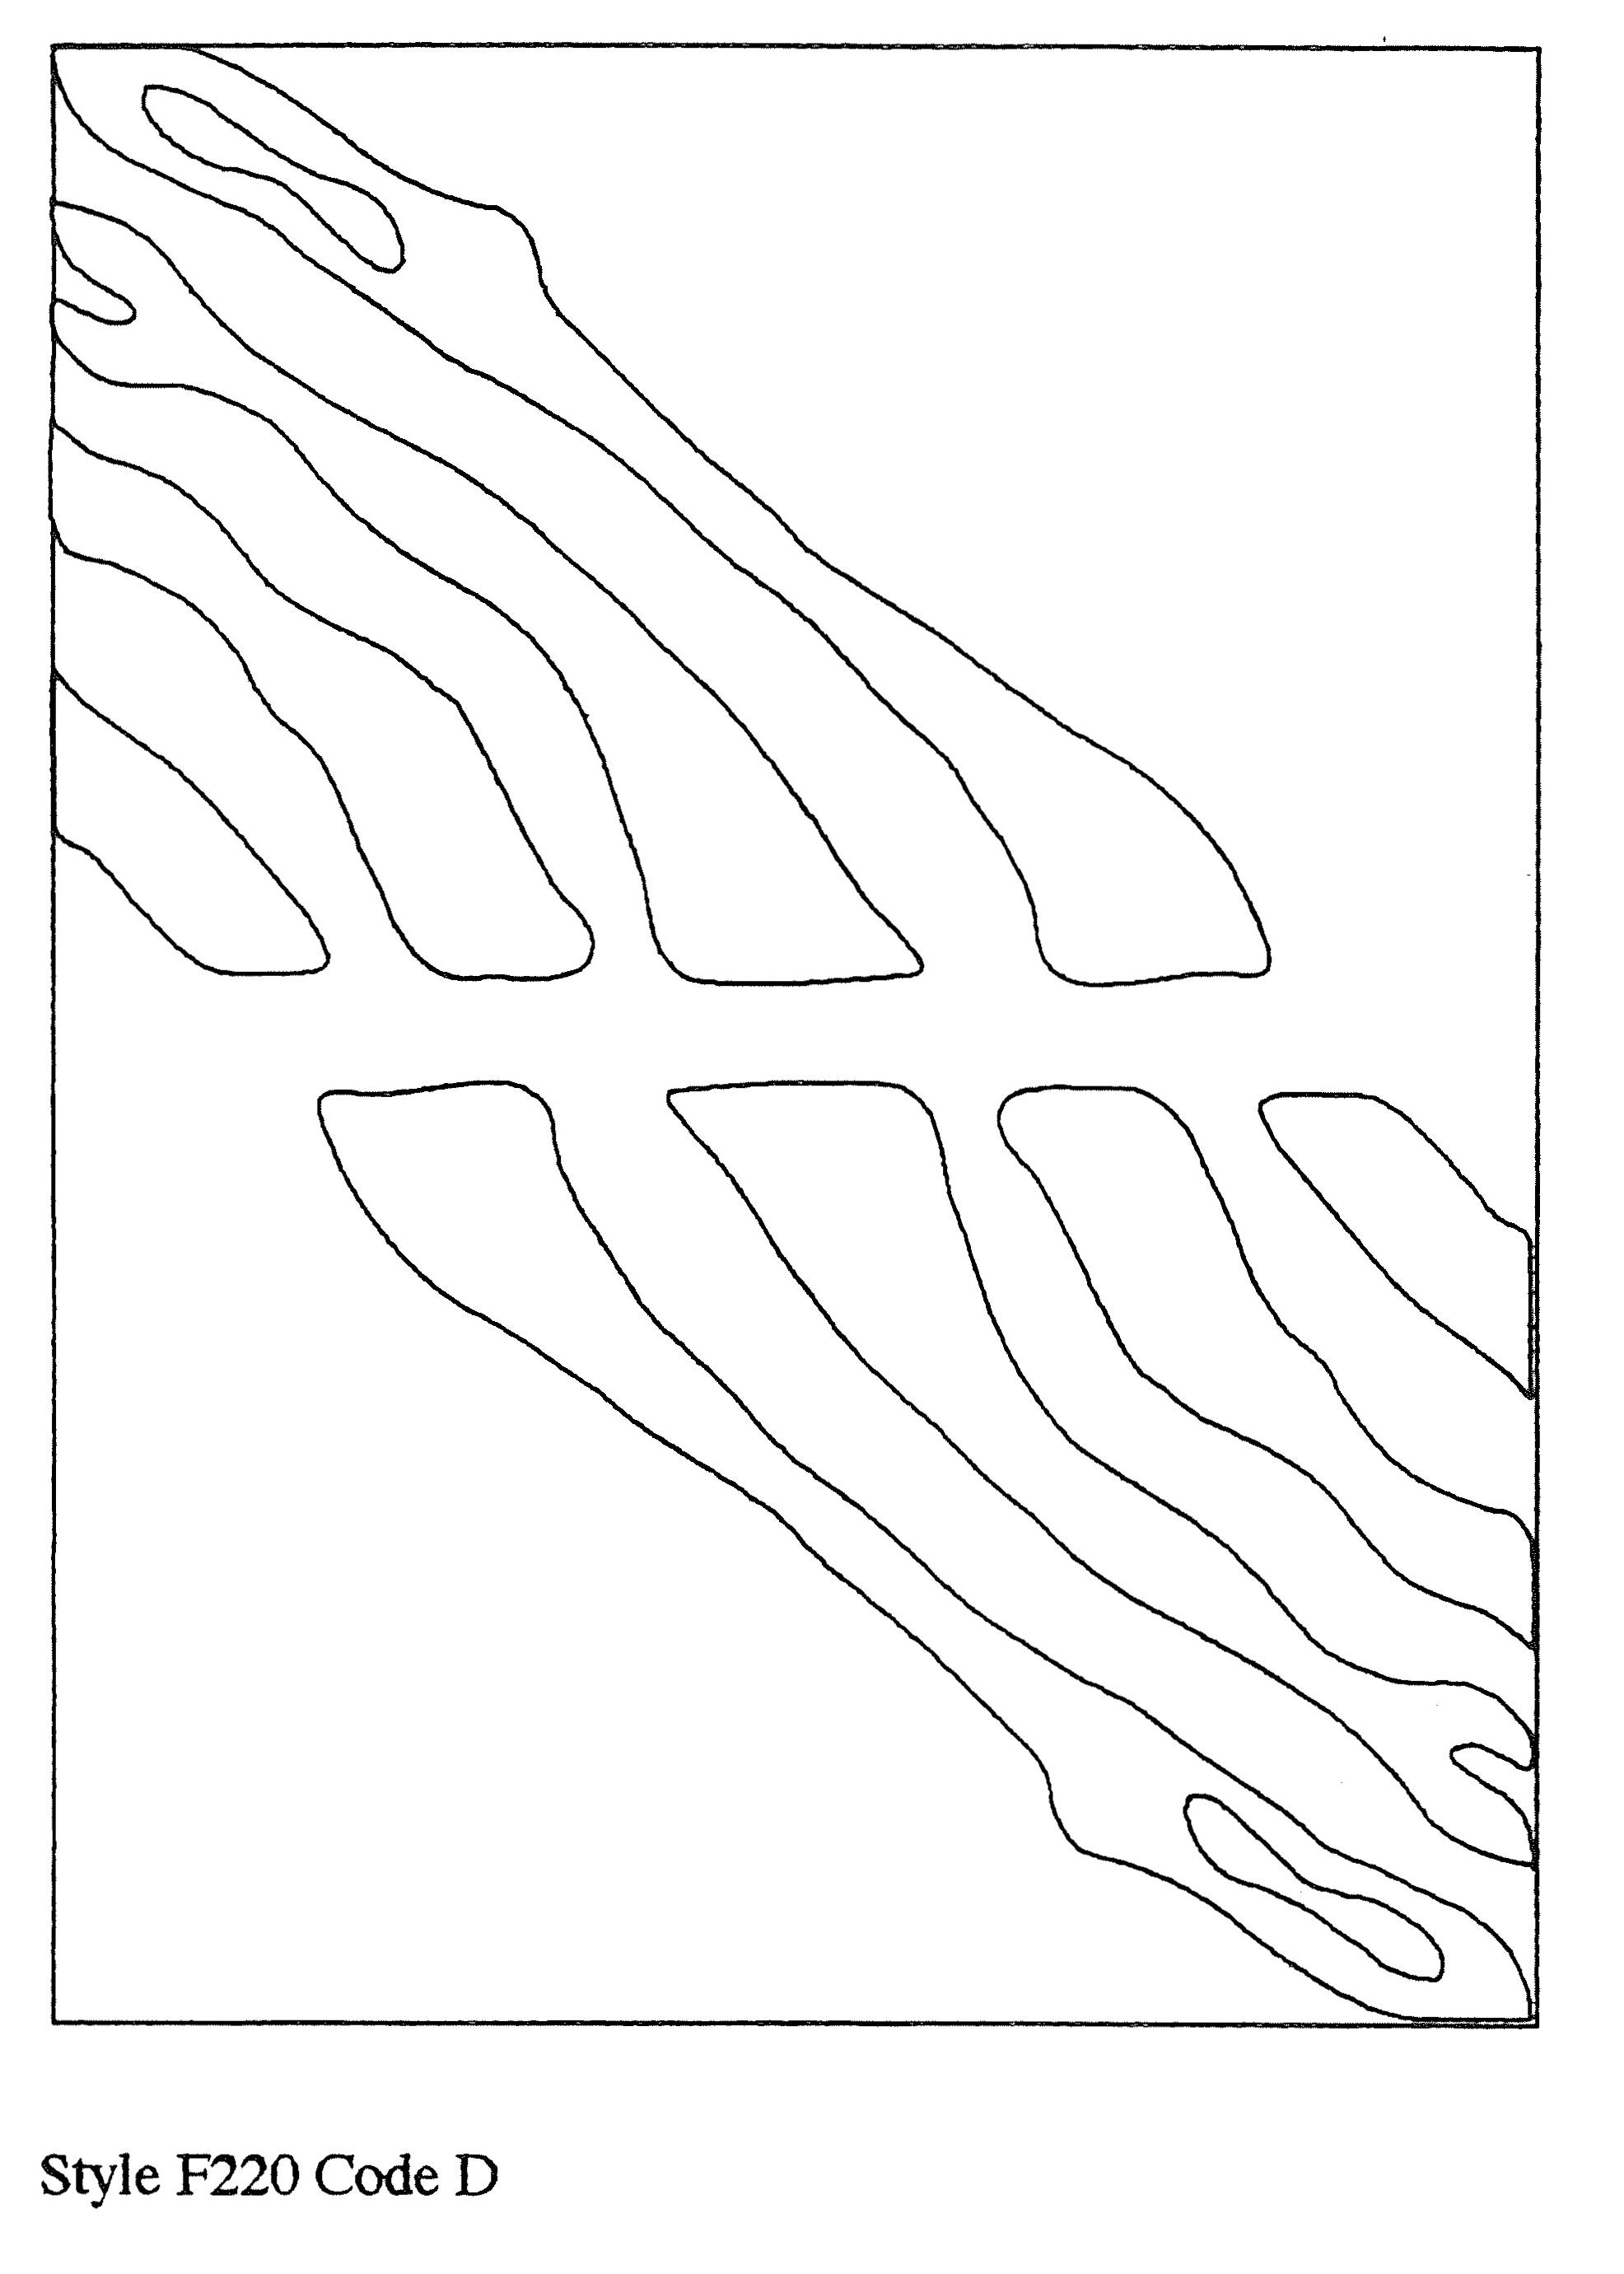 Page 7 copy 3.jpg